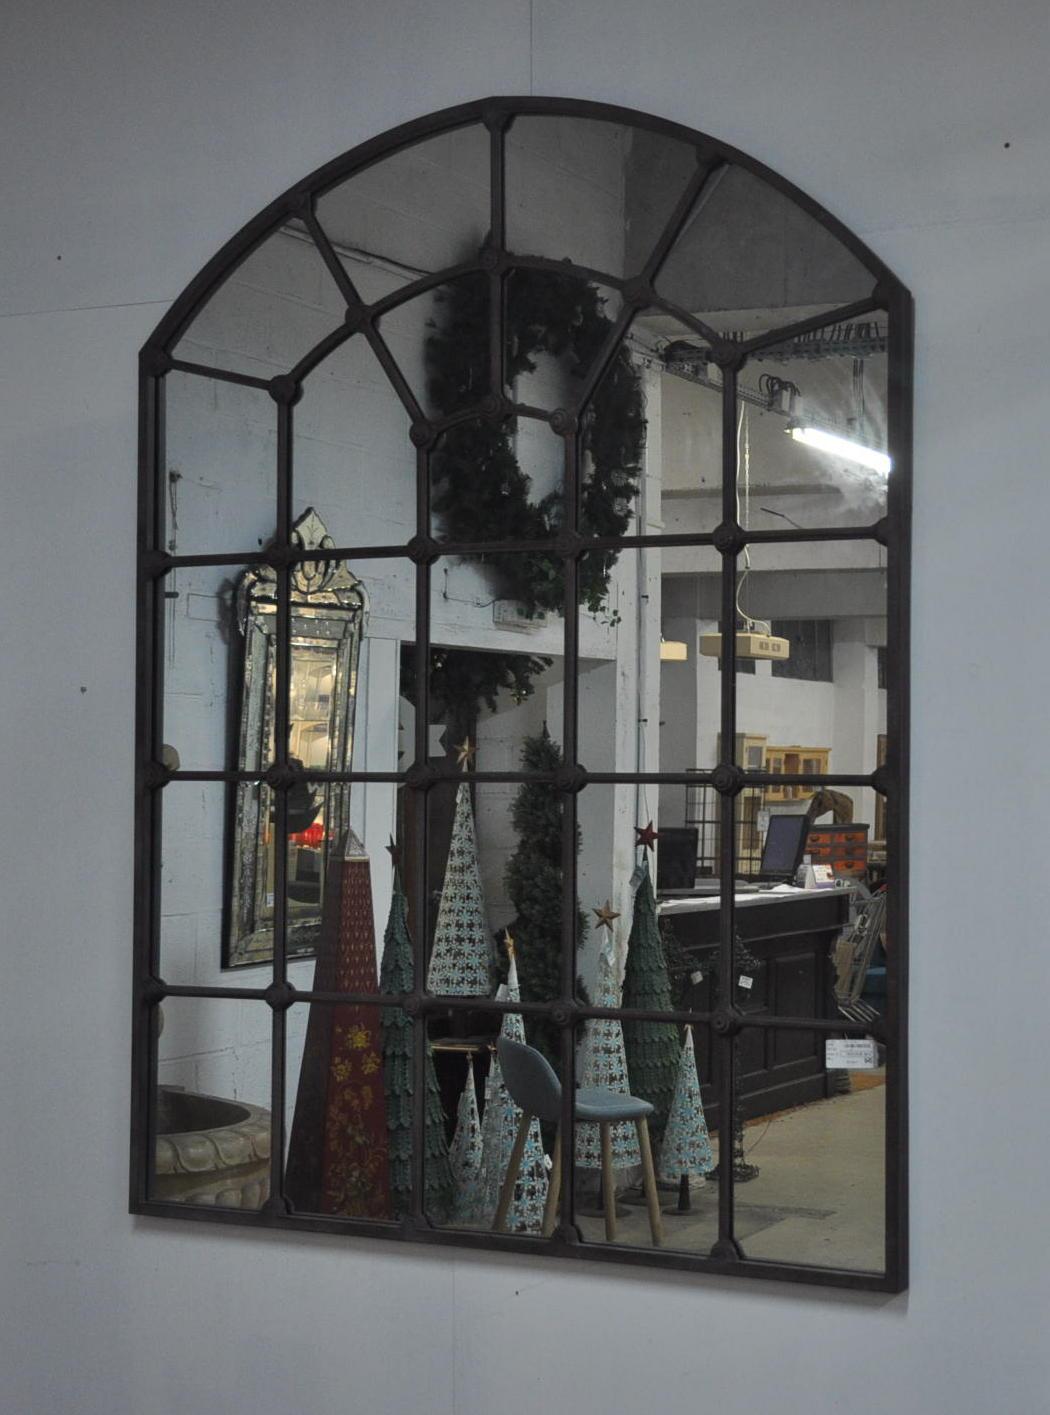 Grand Miroir Atelier En Metal De Style Industriel 140x180 Cm